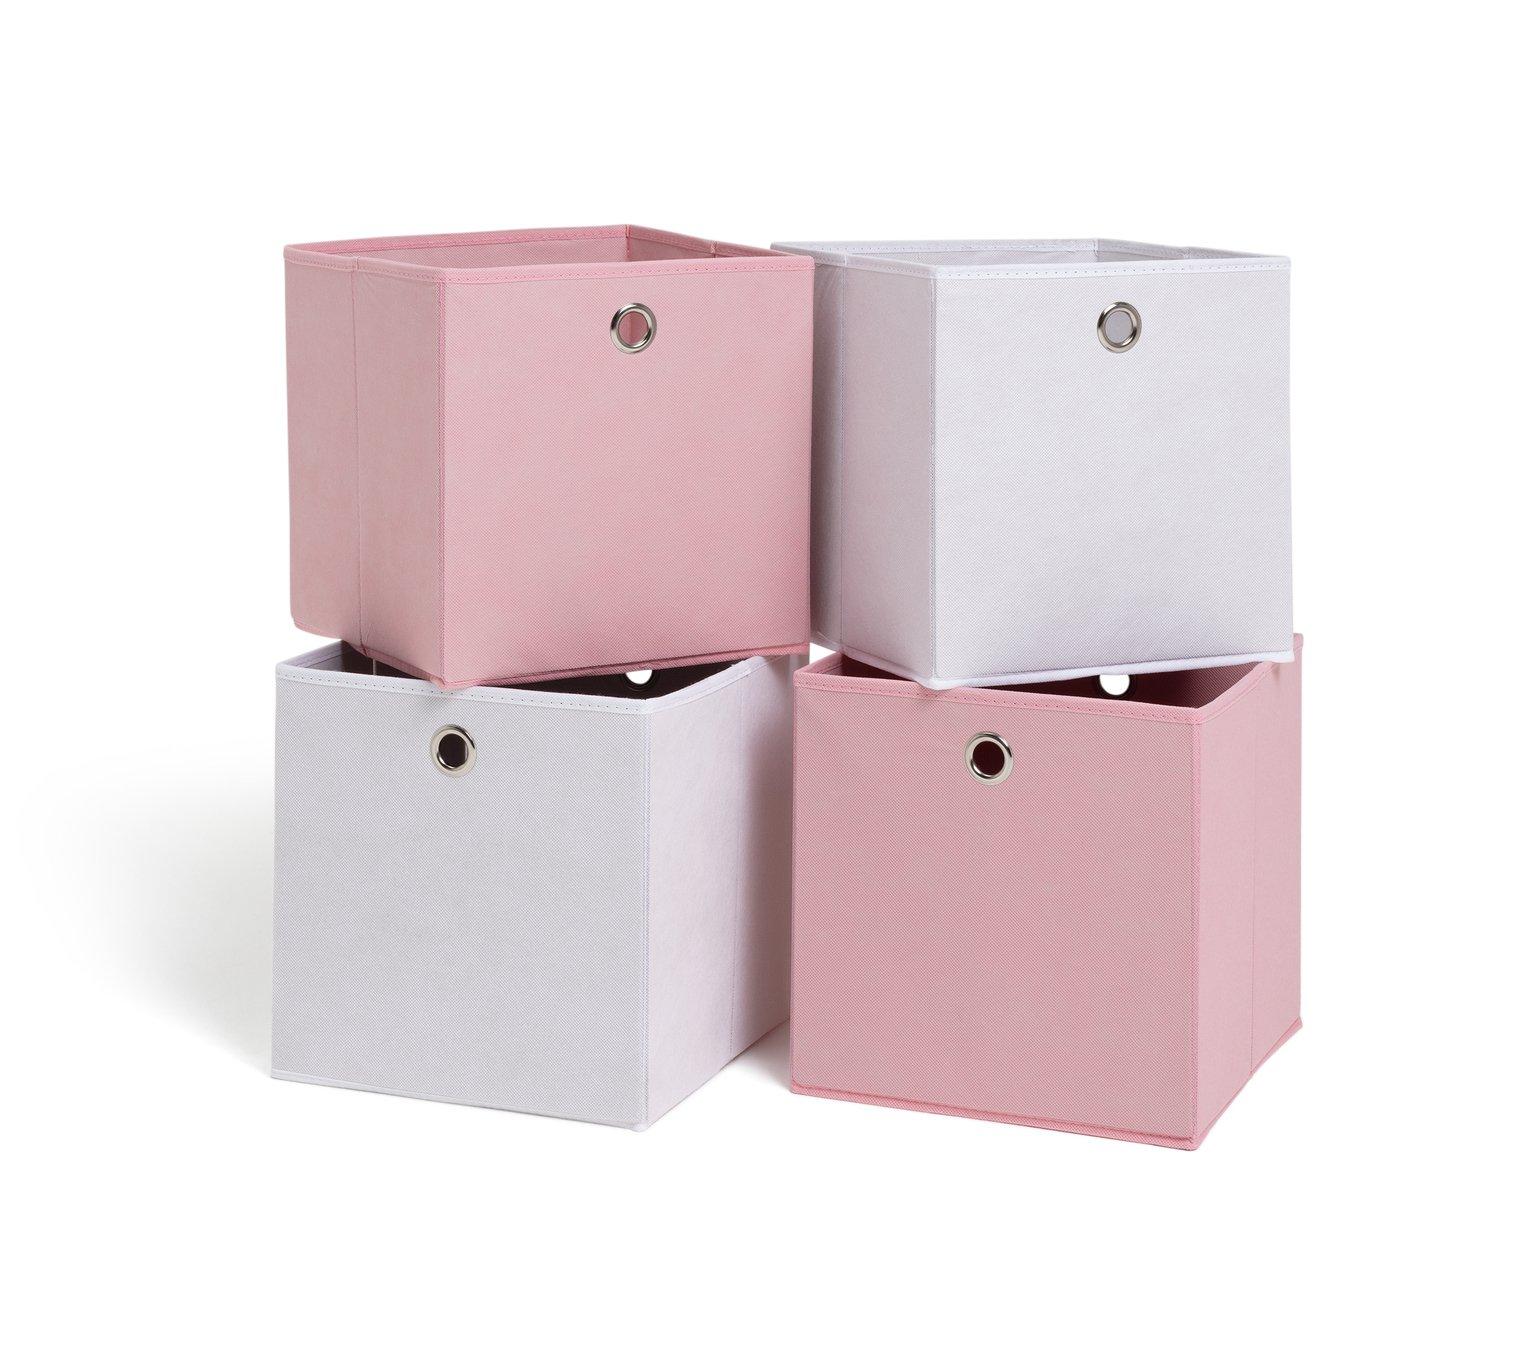 Habitat Set of 4 Squares Boxes - Baby Pink & Off-White